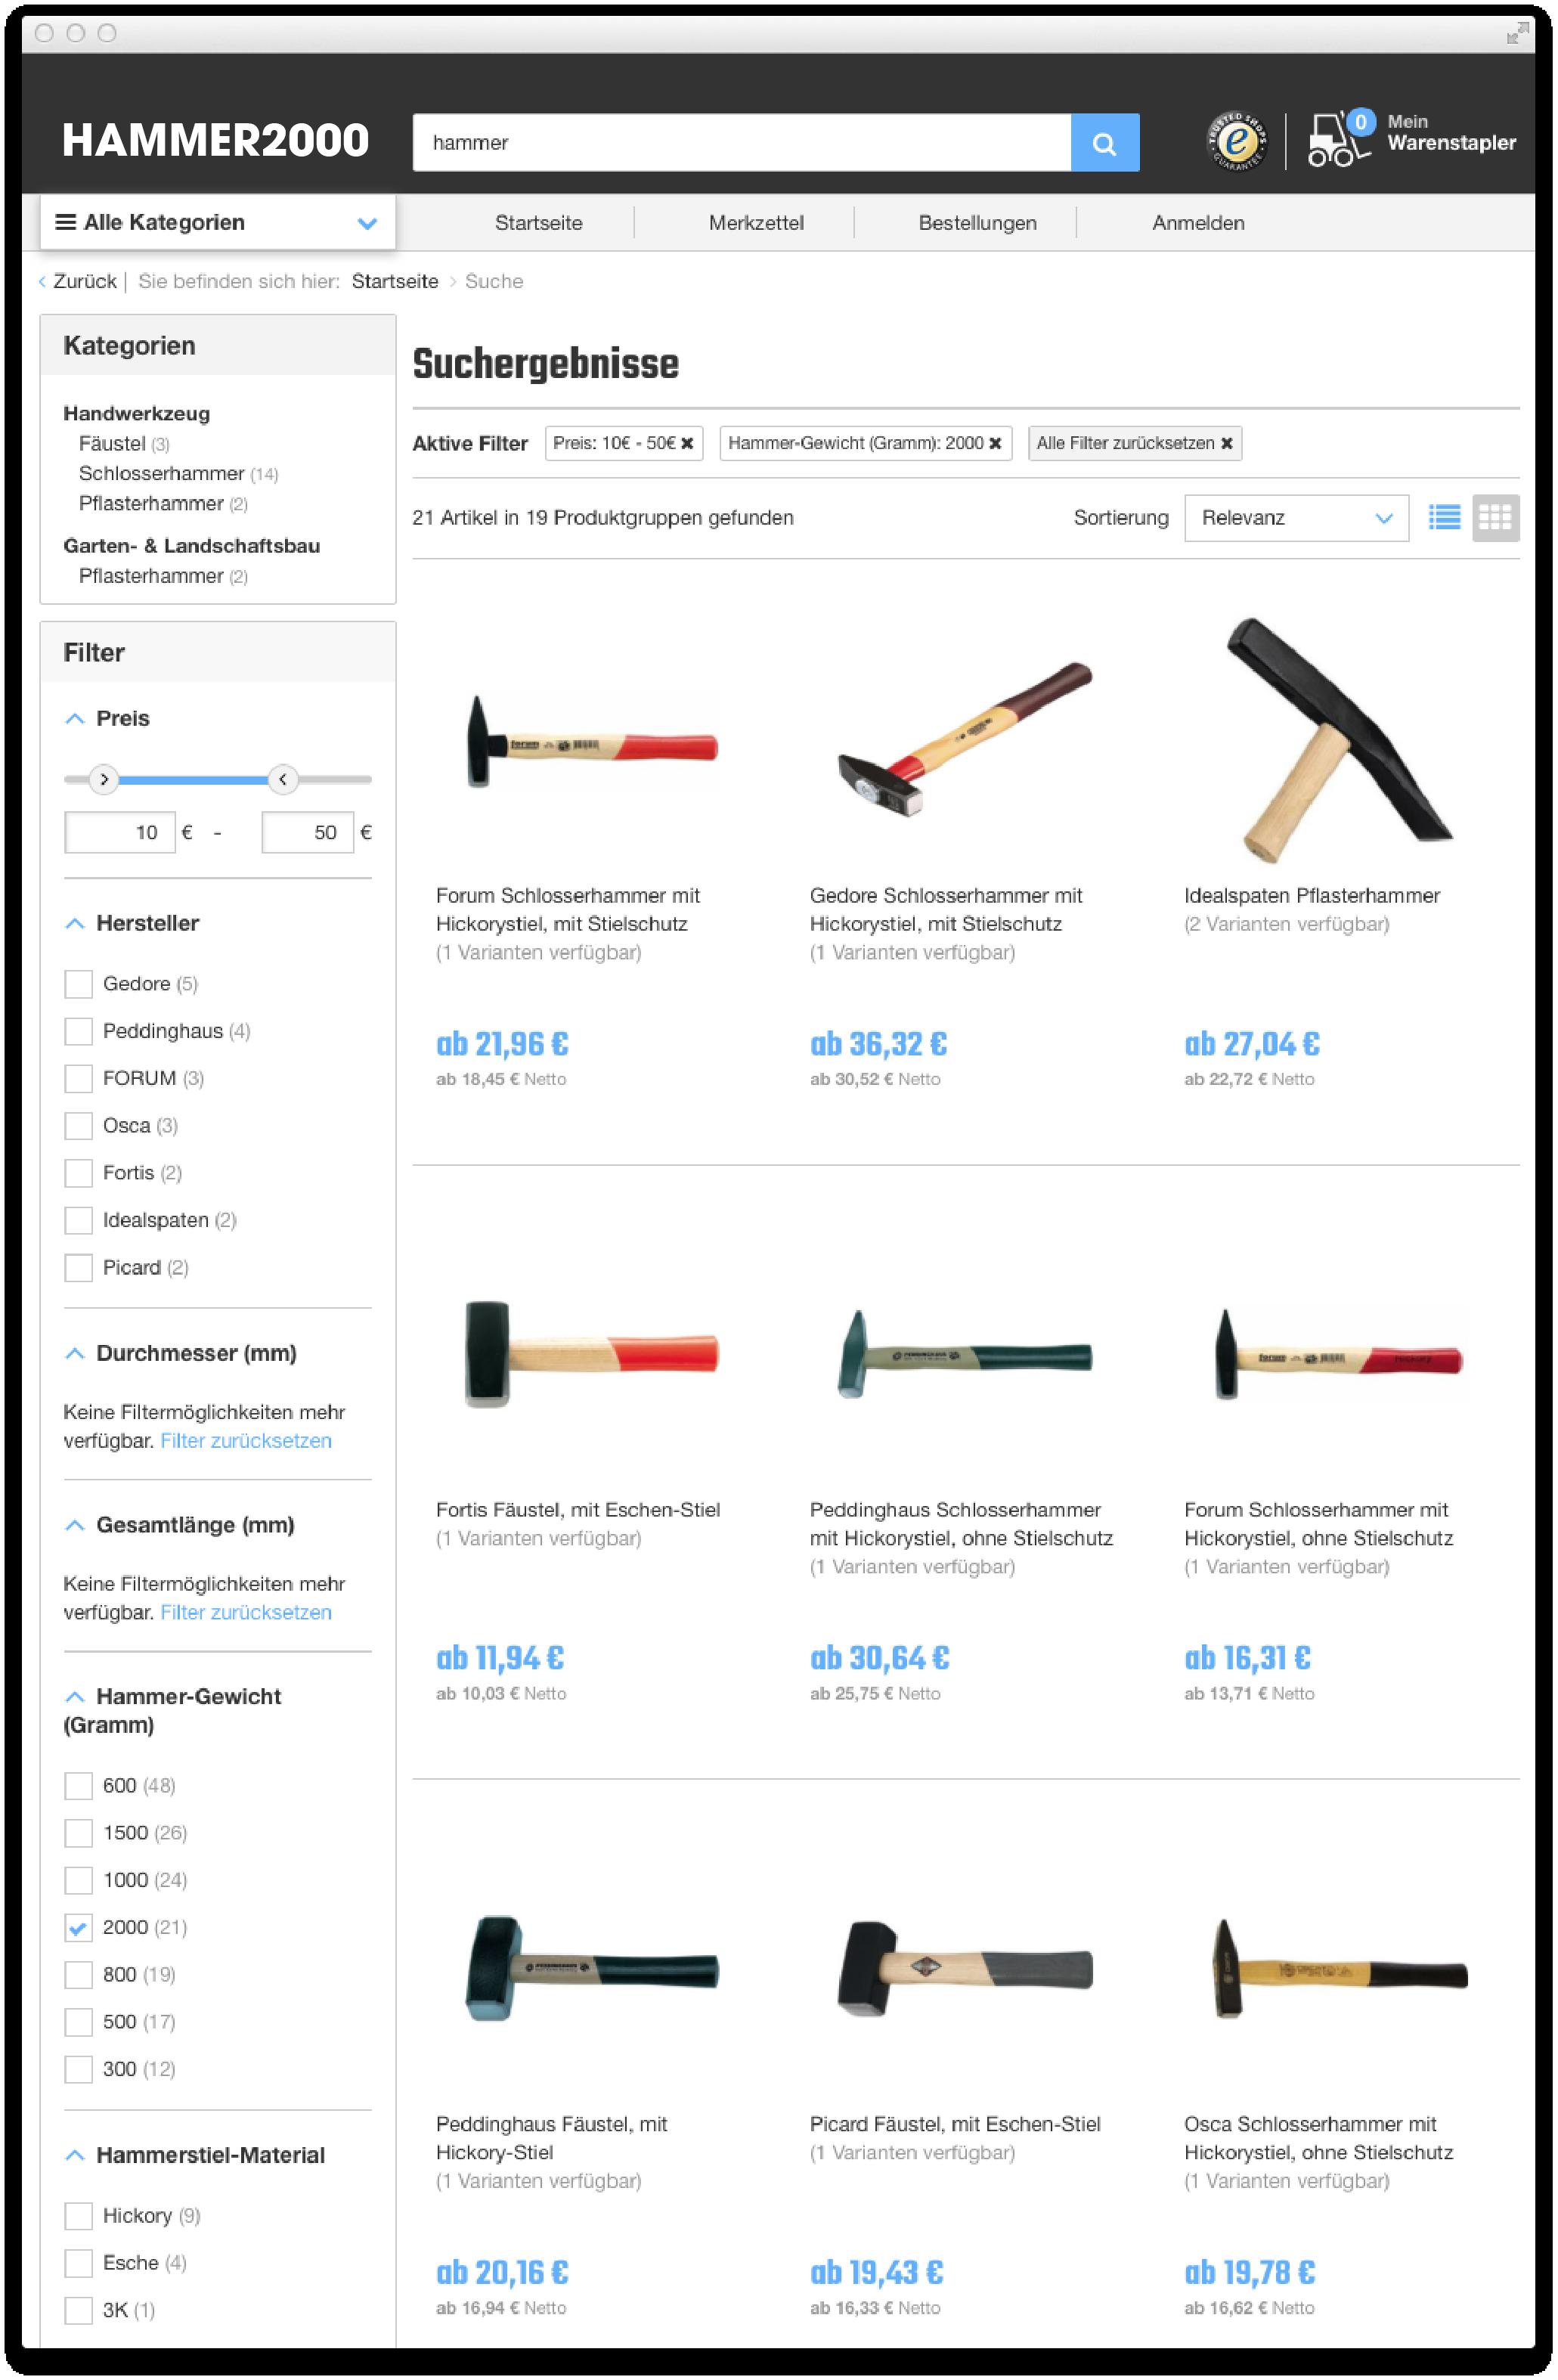 On-site search design patterns for e-commerce: schema